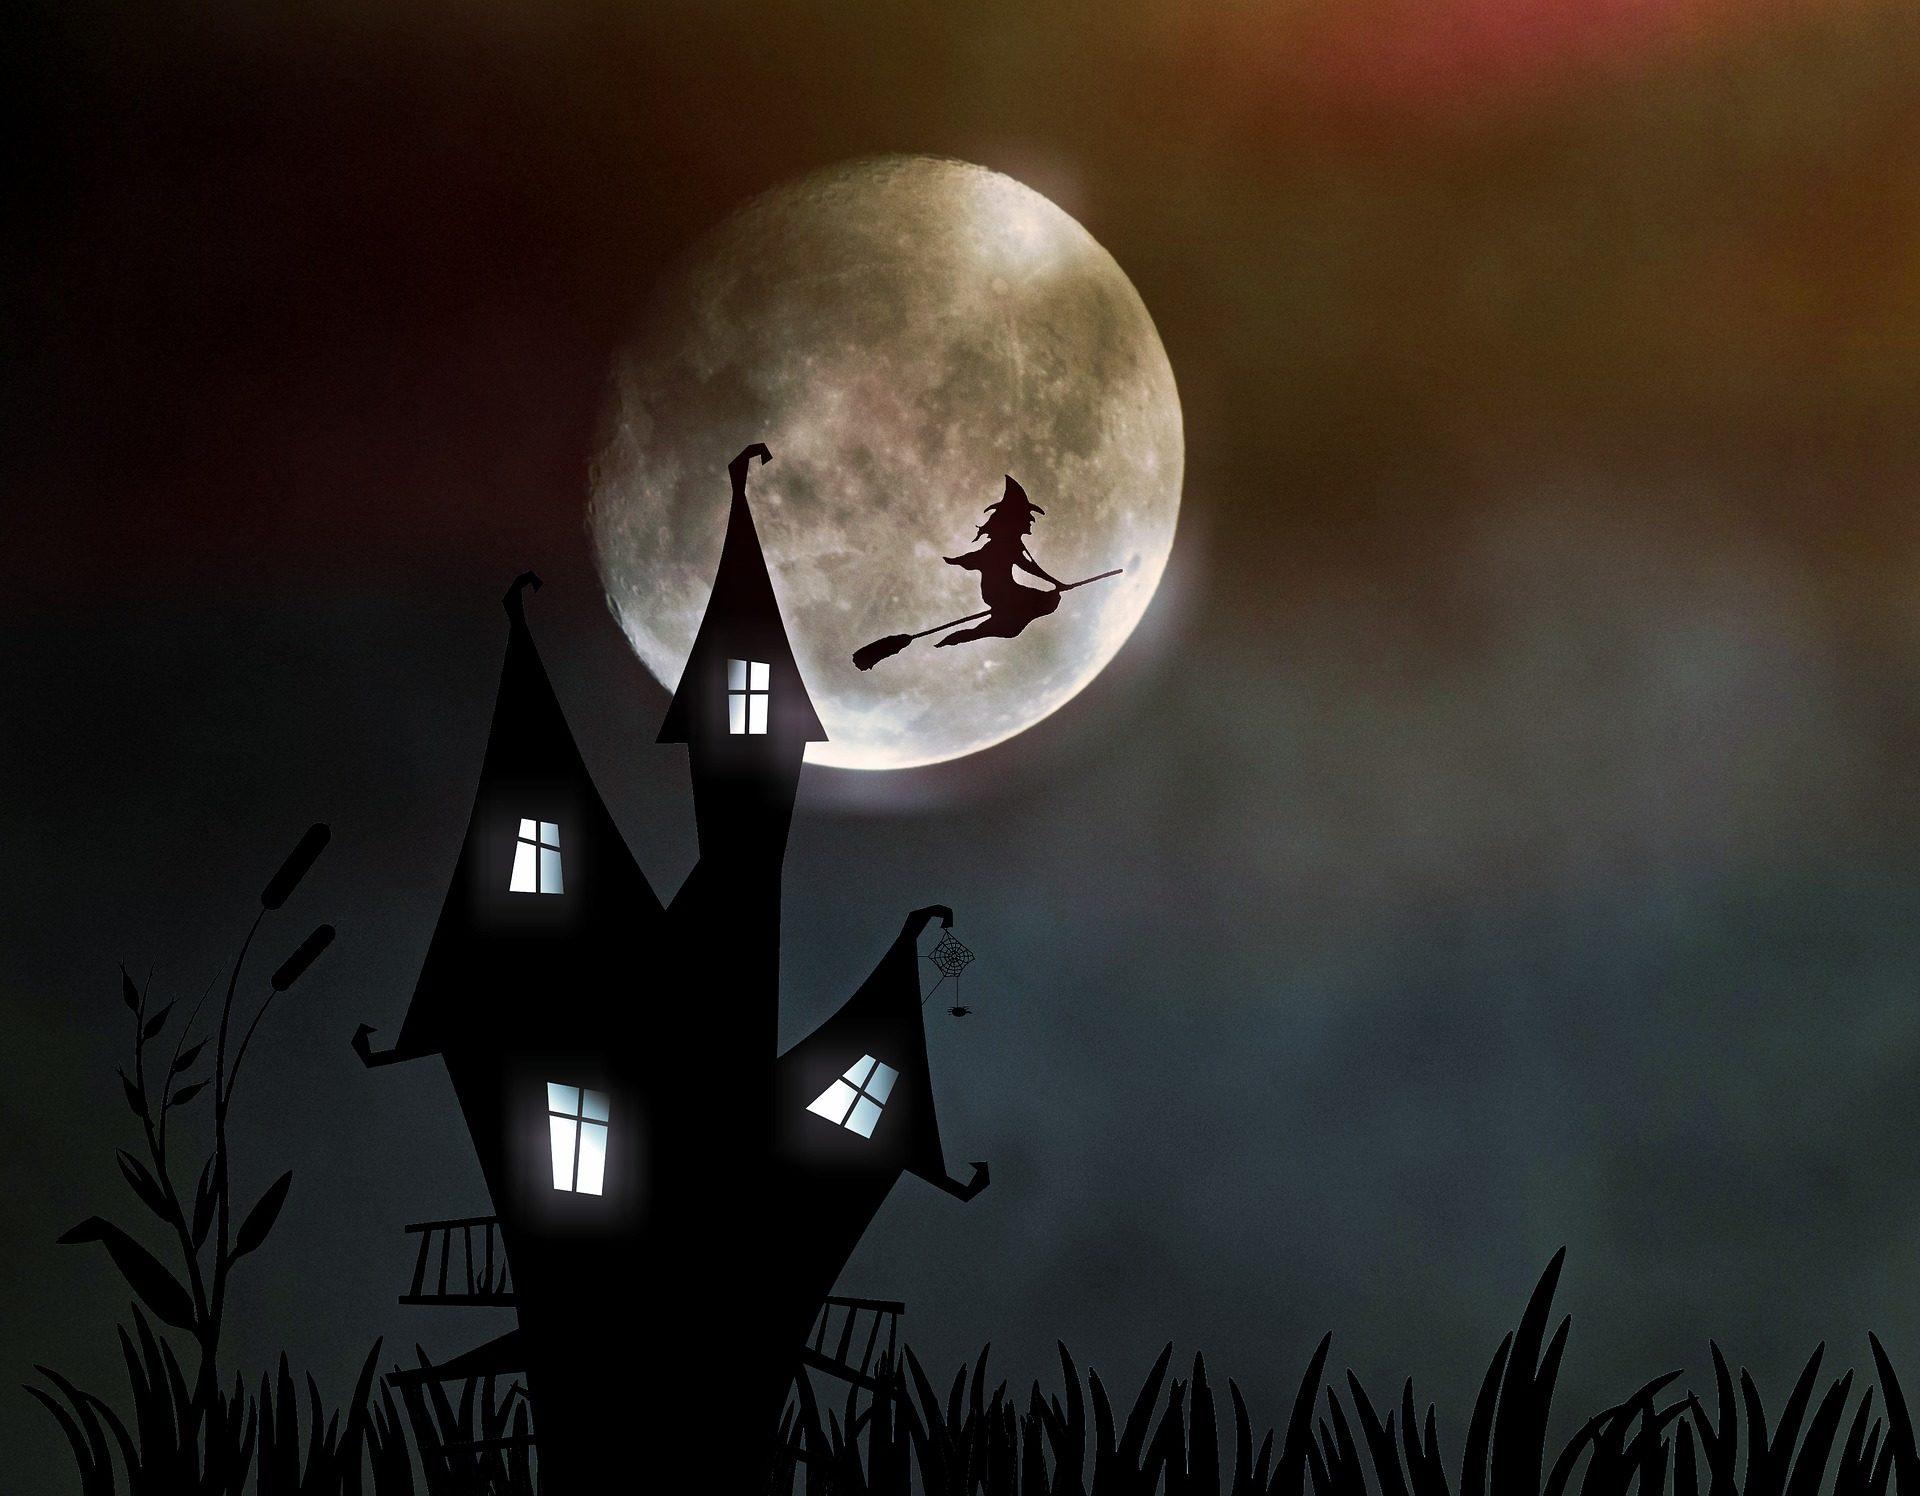 strega, Casa, Luna, Horror, paura, Halloween - Sfondi HD - Professor-falken.com